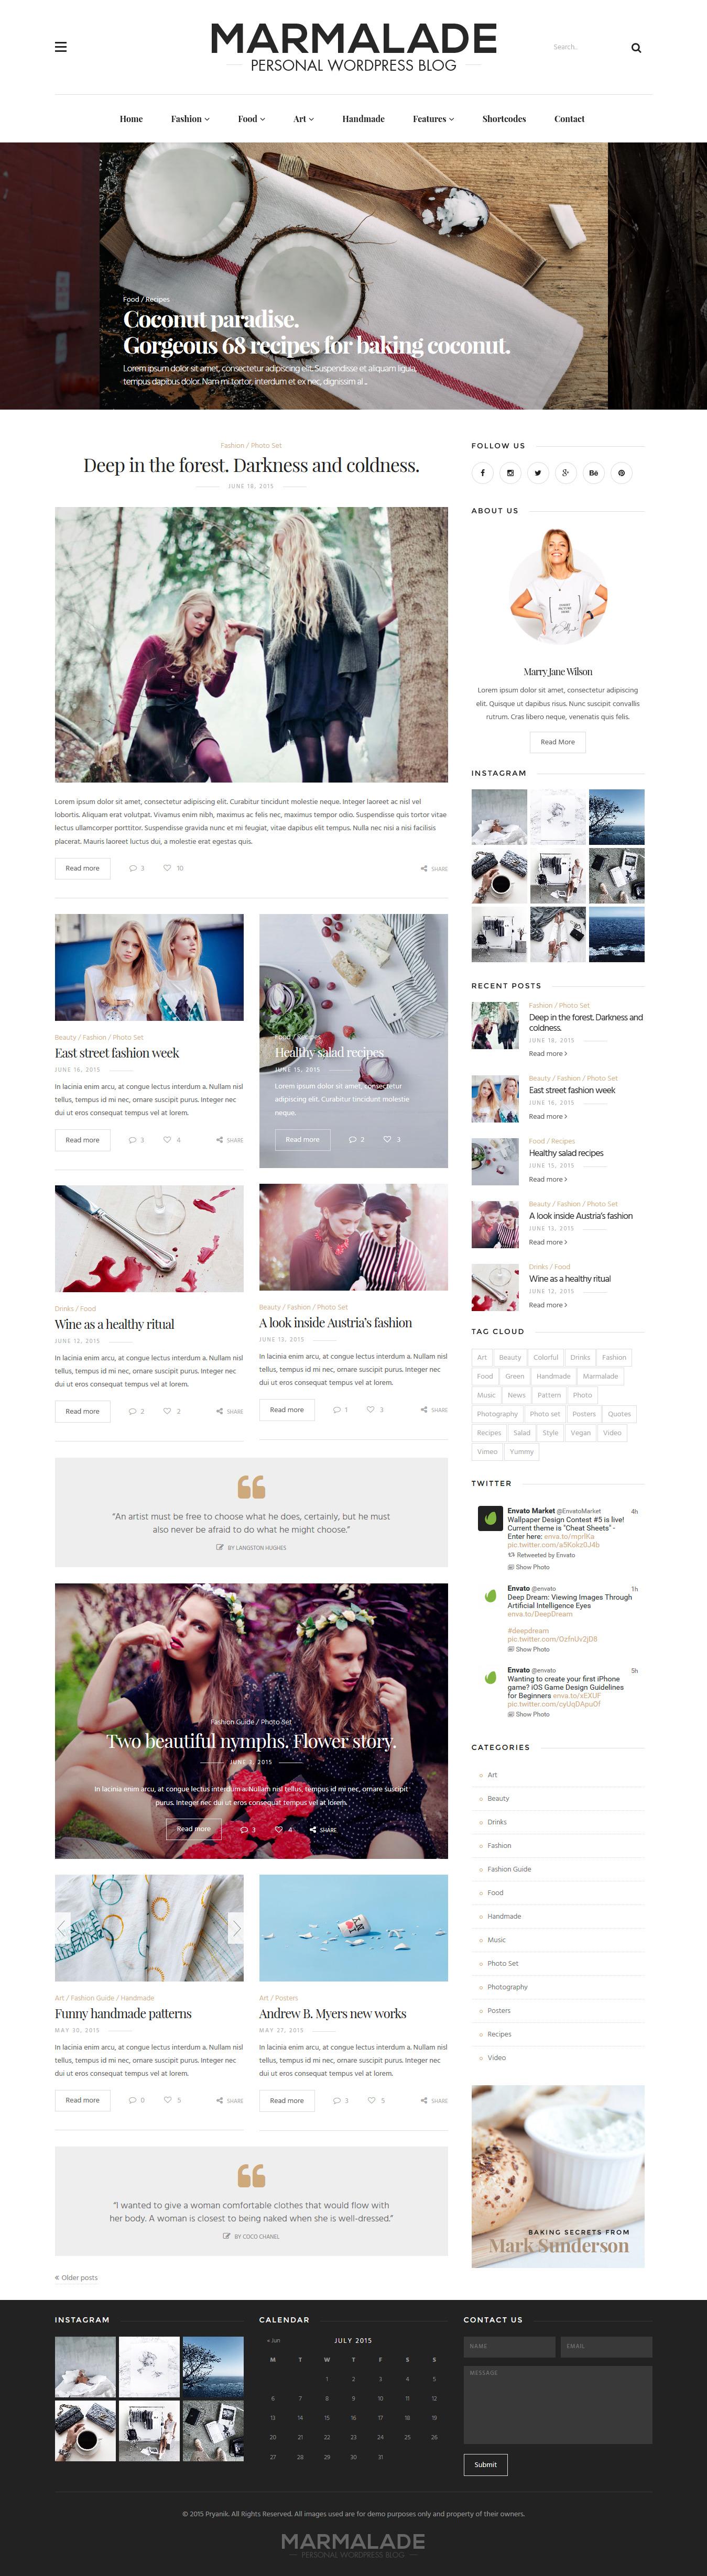 The Marmalade Personal Wordpress Blog Theme Website Blogging Webdesign Download Http Themeforest Net Item The Marmalade Personal Wordpress Blog Theme 11